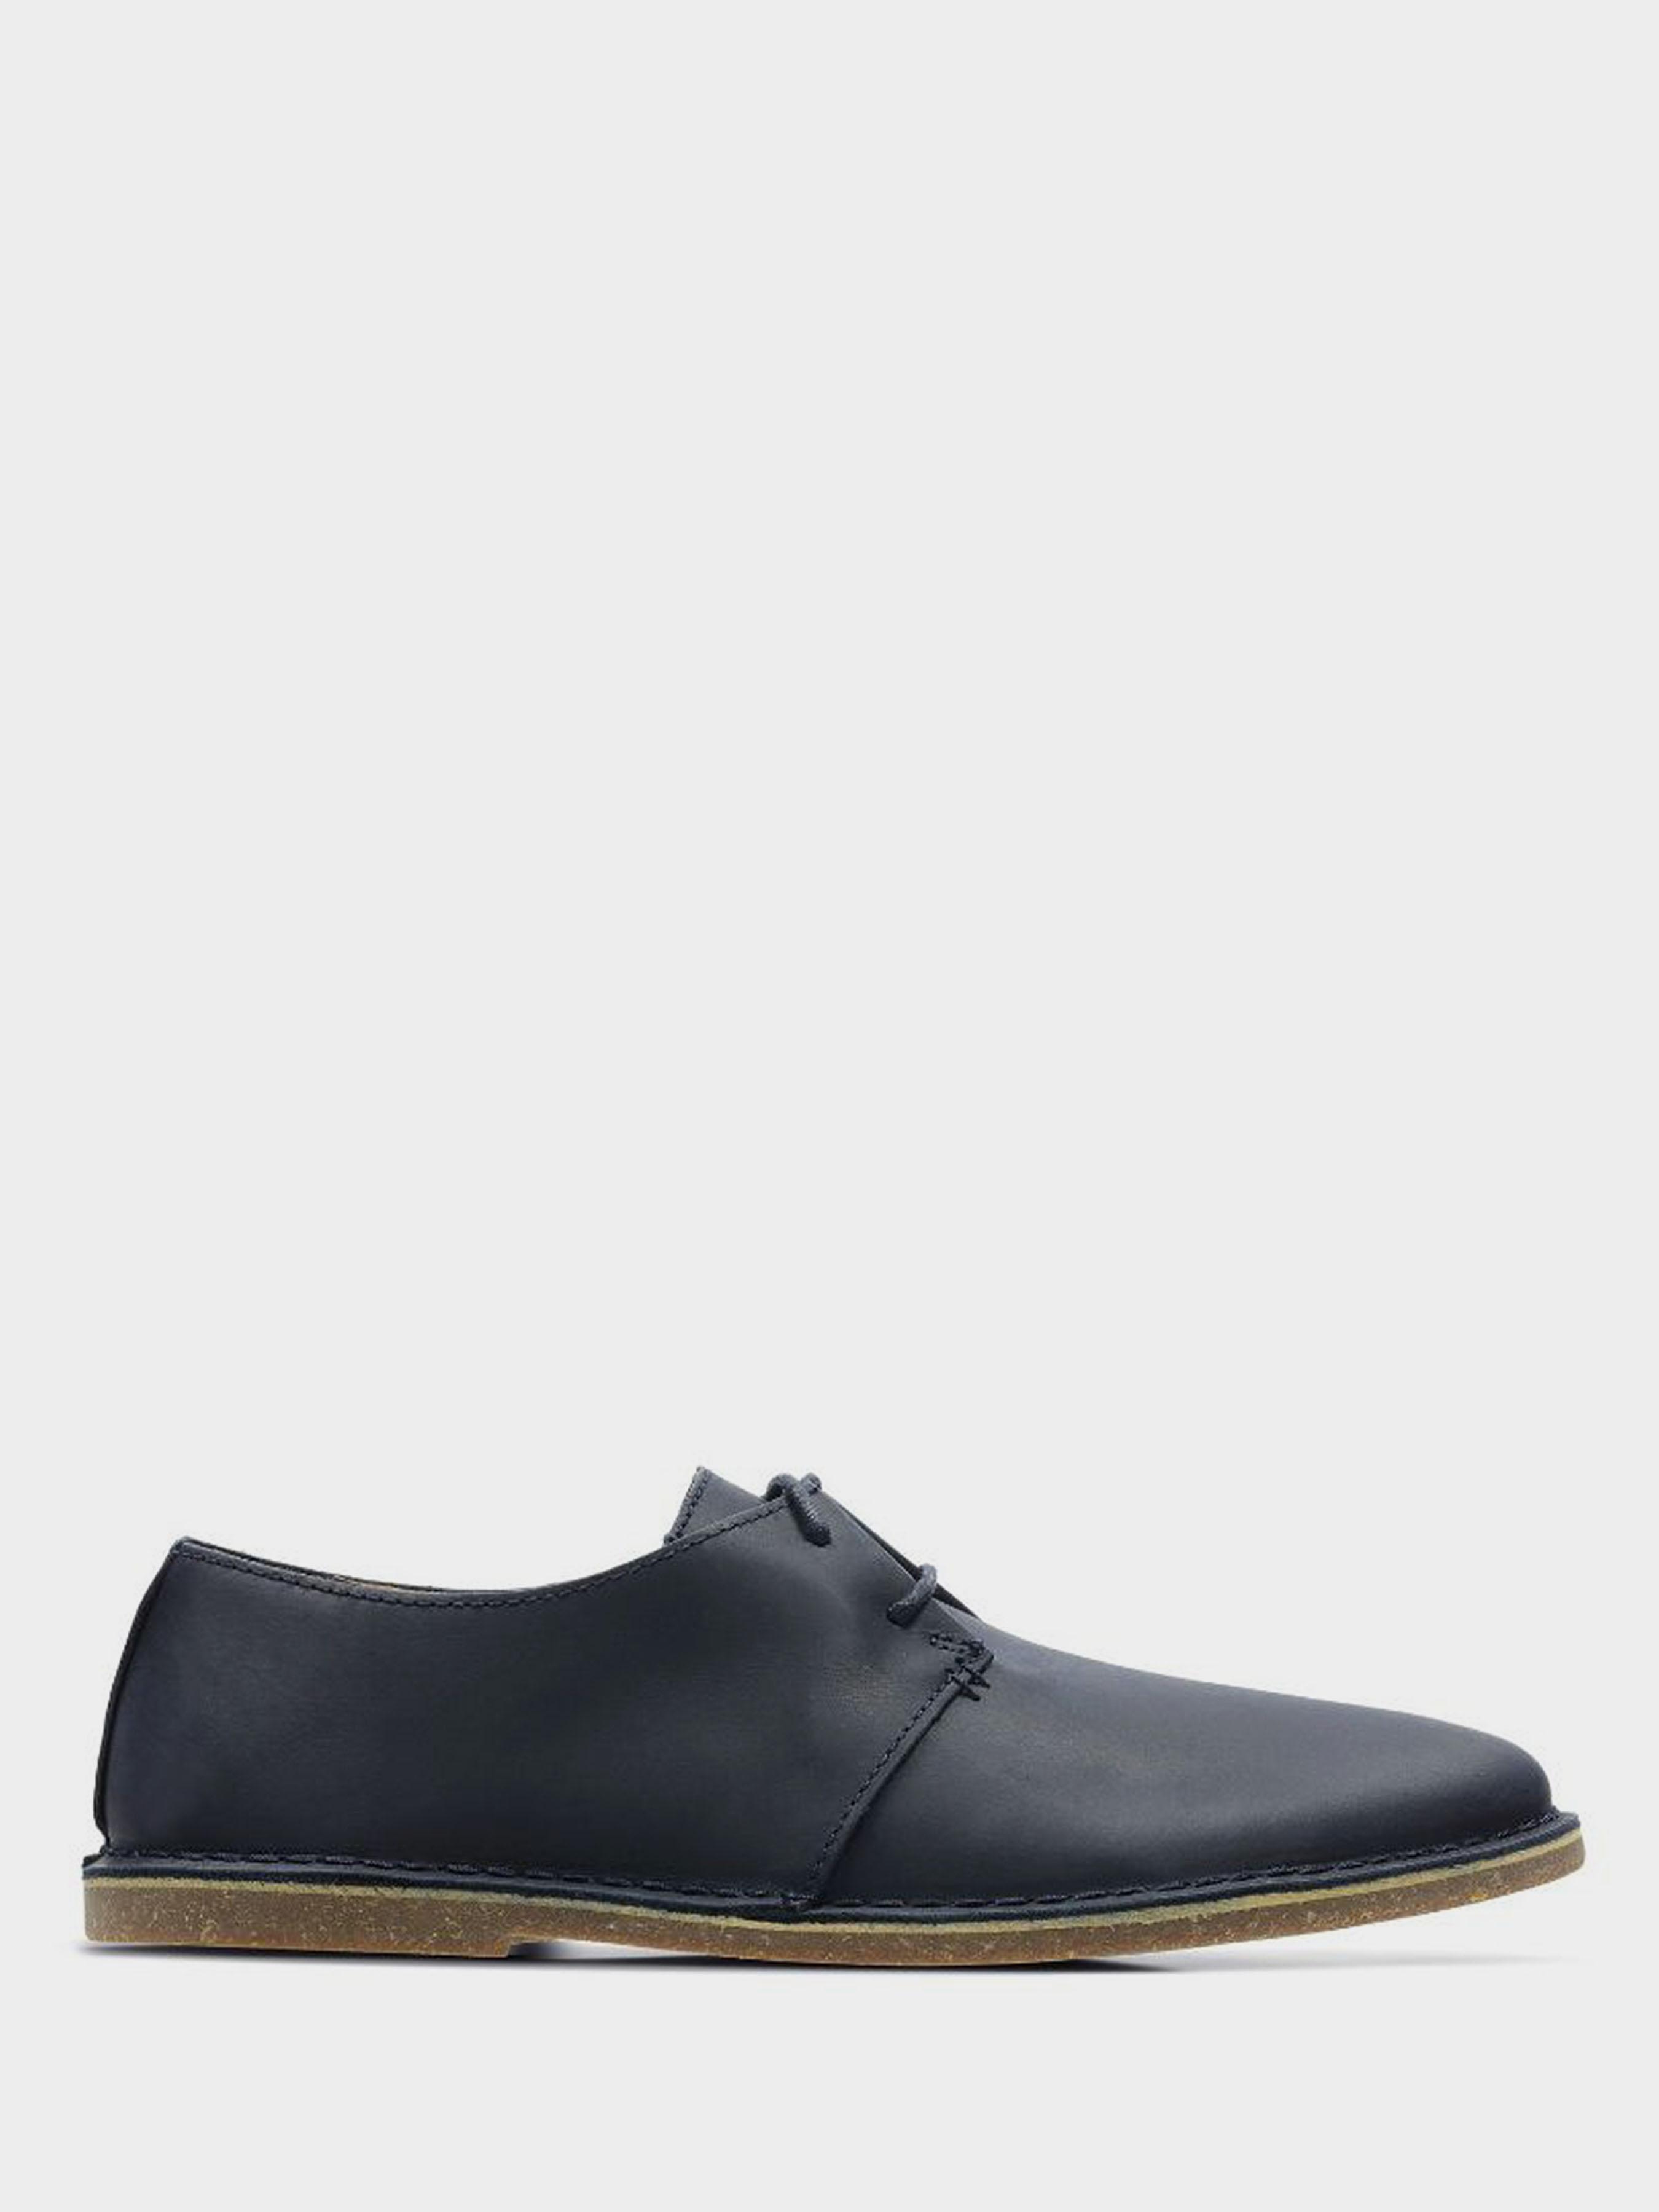 Туфли мужские Clarks Baltimore Lace OM2916 размеры обуви, 2017